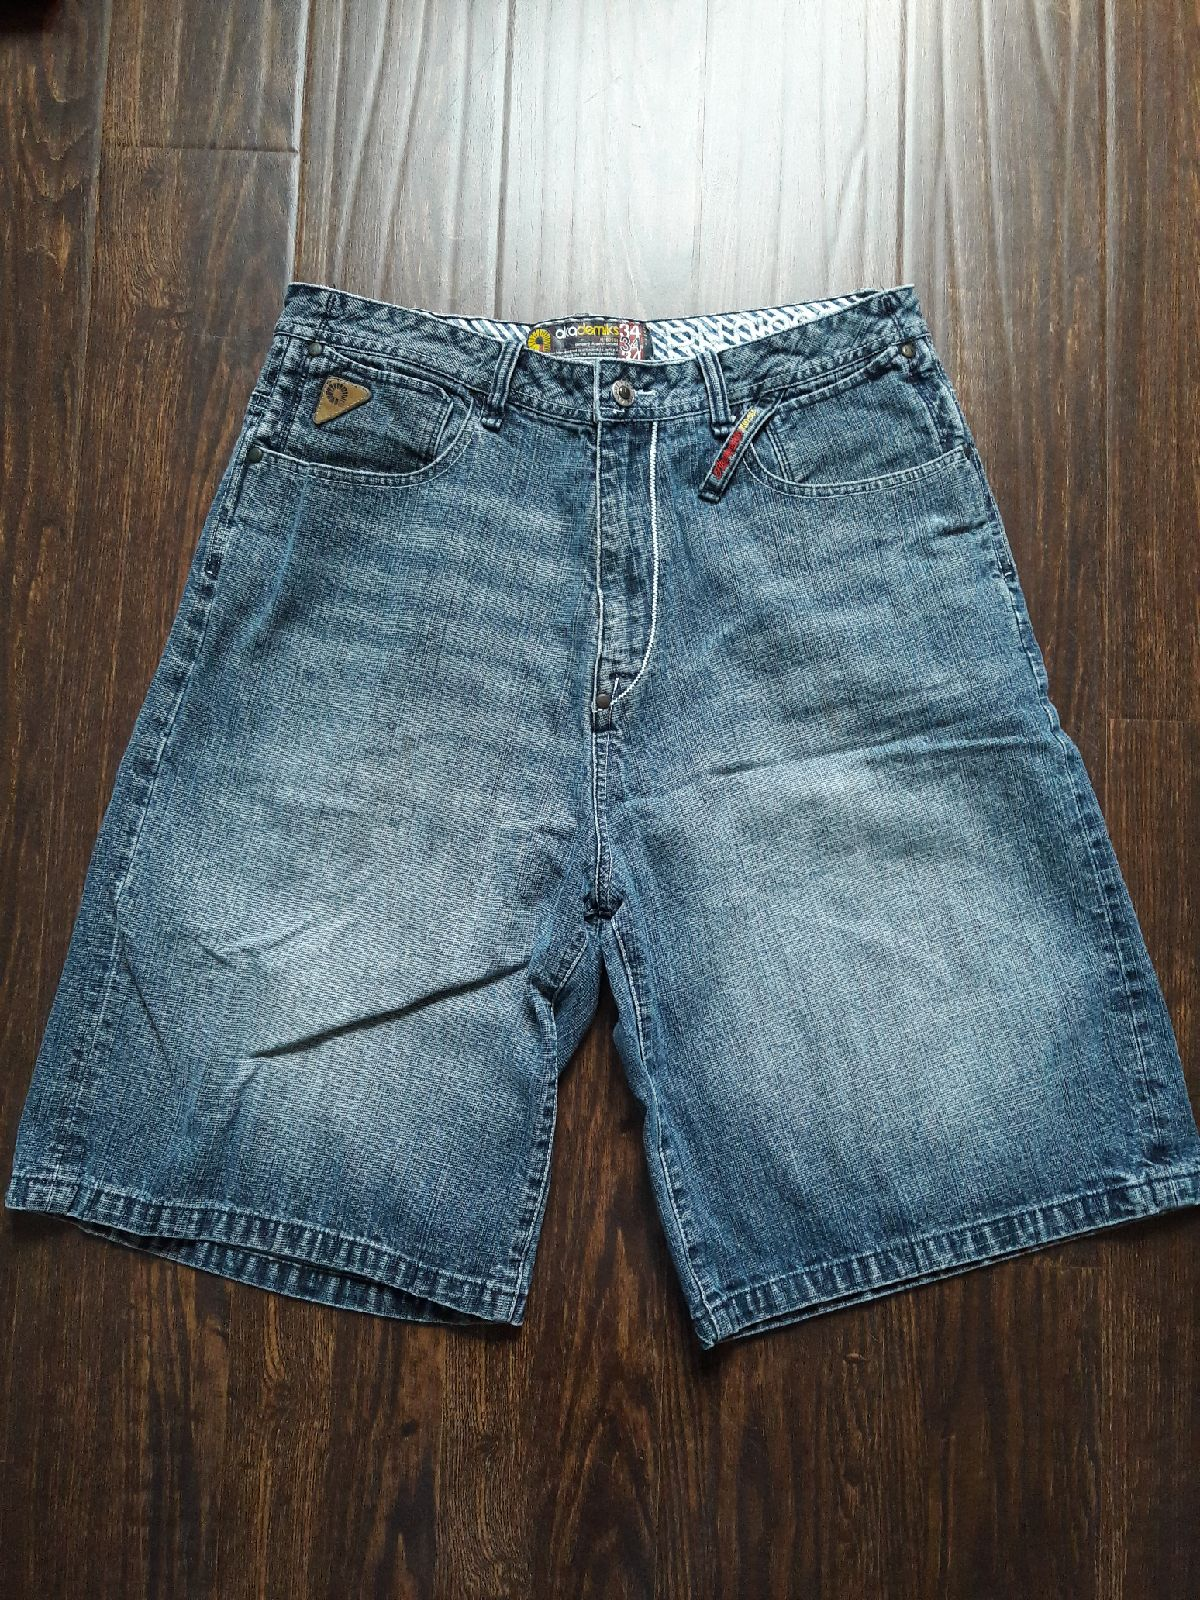 Akademicks Jean Shorts